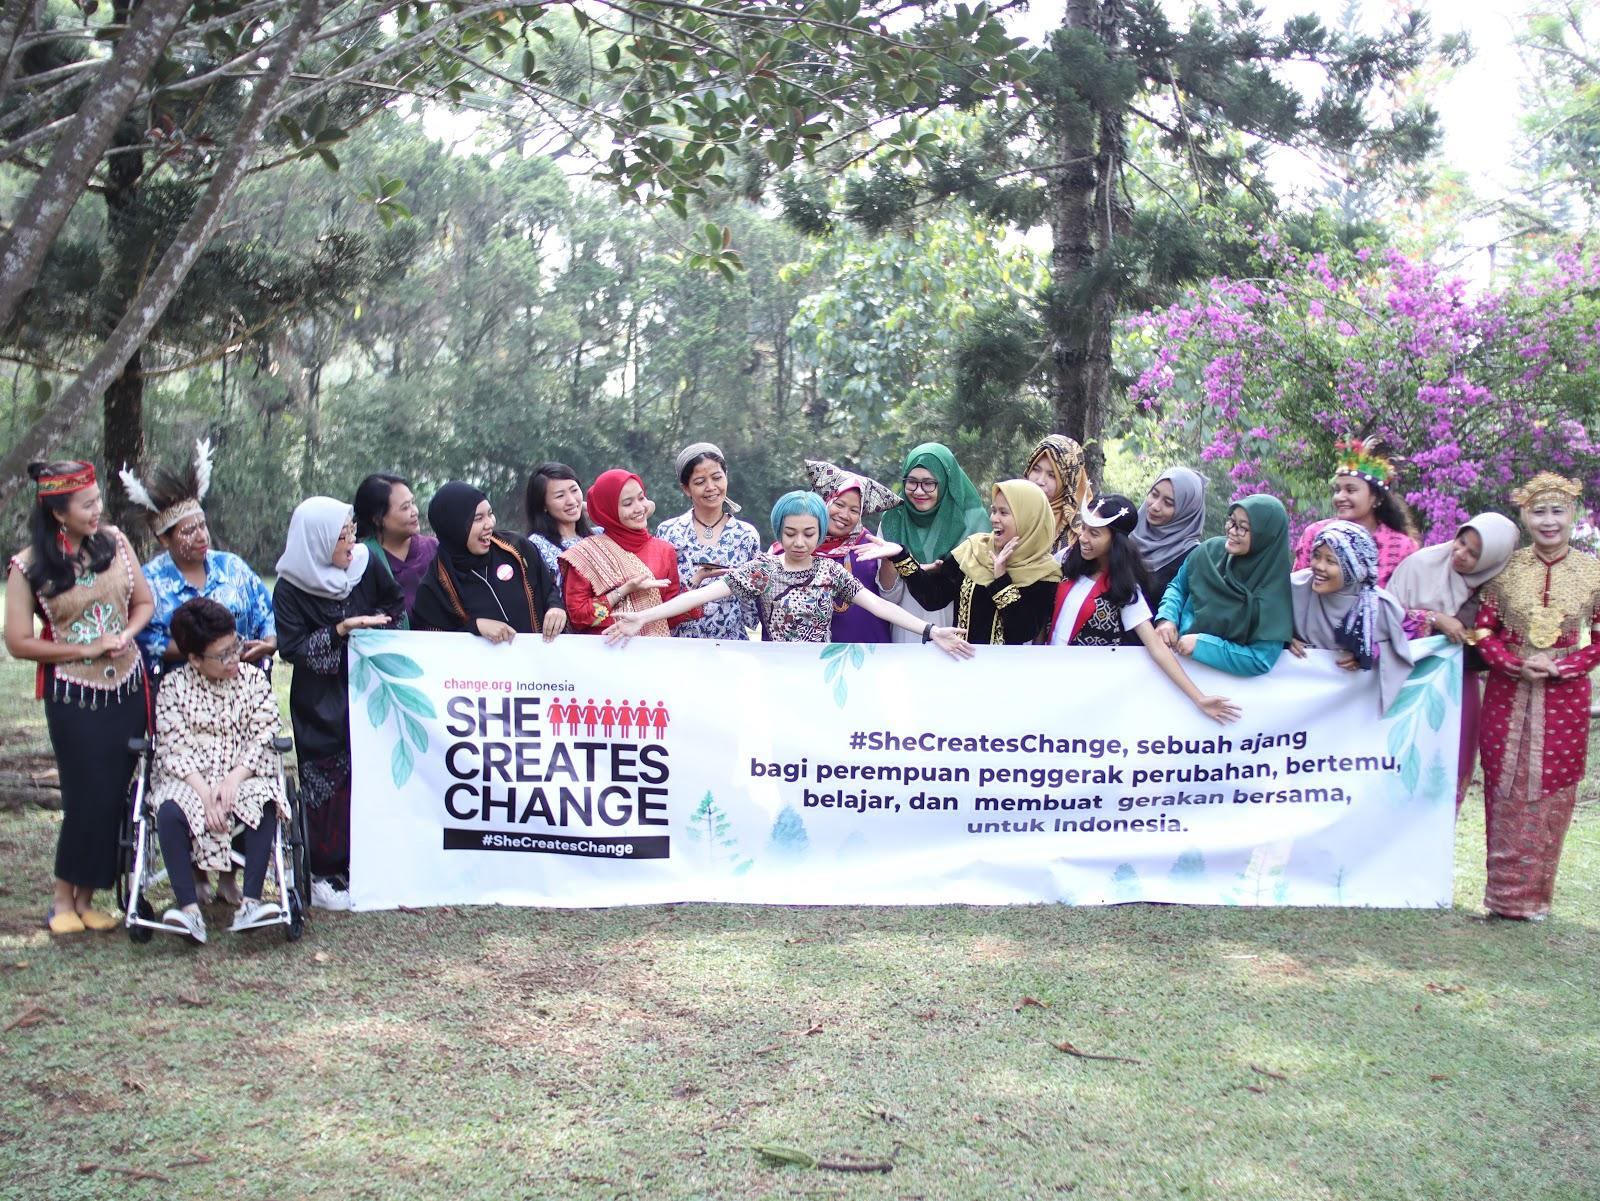 Cerita dari Cianjur: Menegakkan Martabat Perempuan Diatas Meja Kepemimpinan untuk Mendorong Perubahan dan Keadilan Sosial